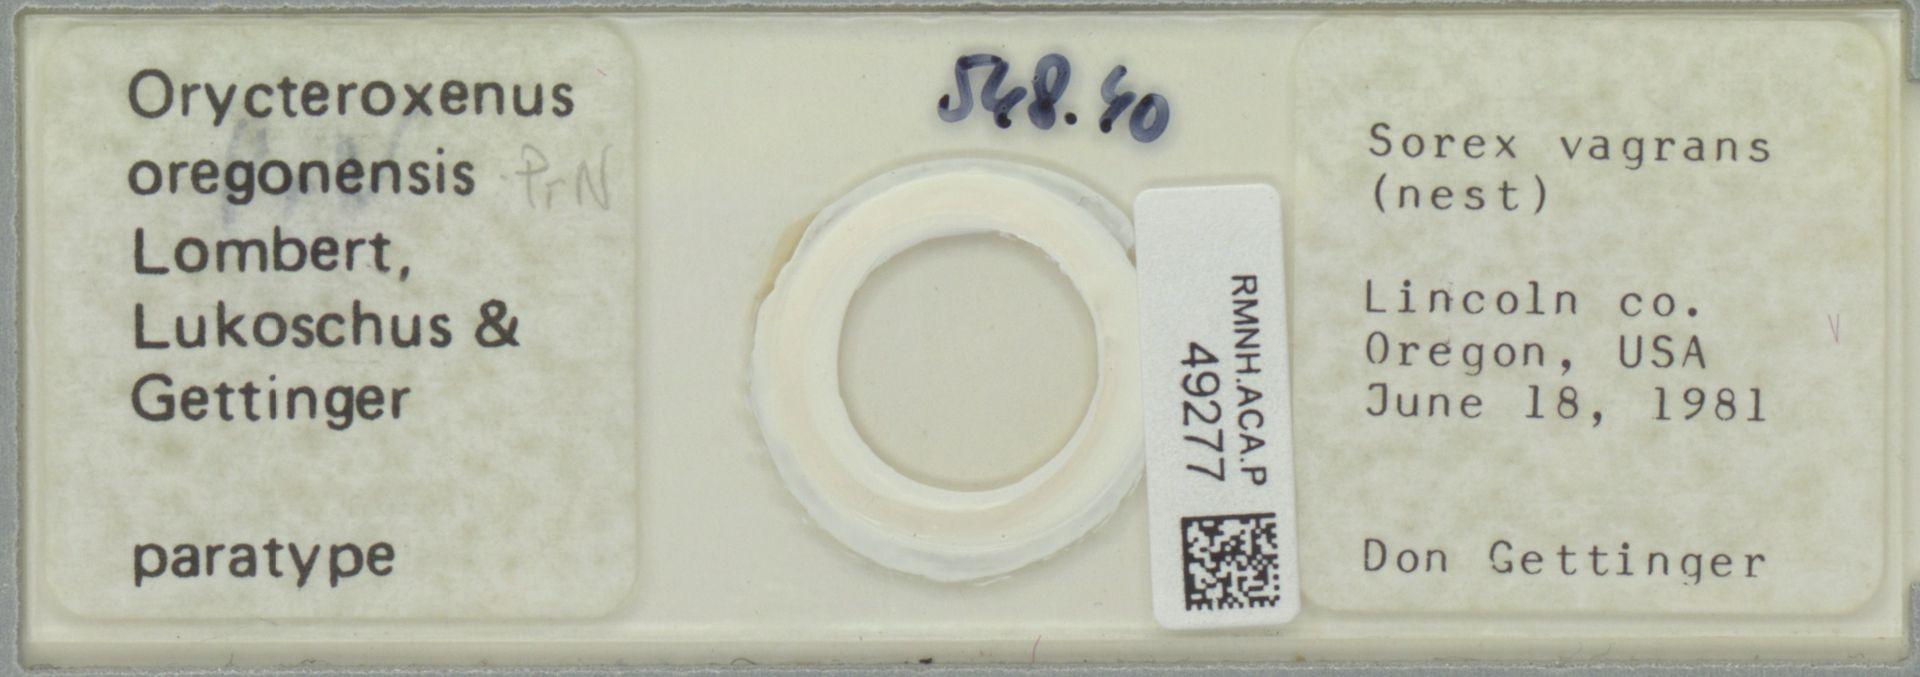 RMNH.ACA.P.49277 | Orycteroxenus oregonensis Lombert, Lukoschus & Gettinger